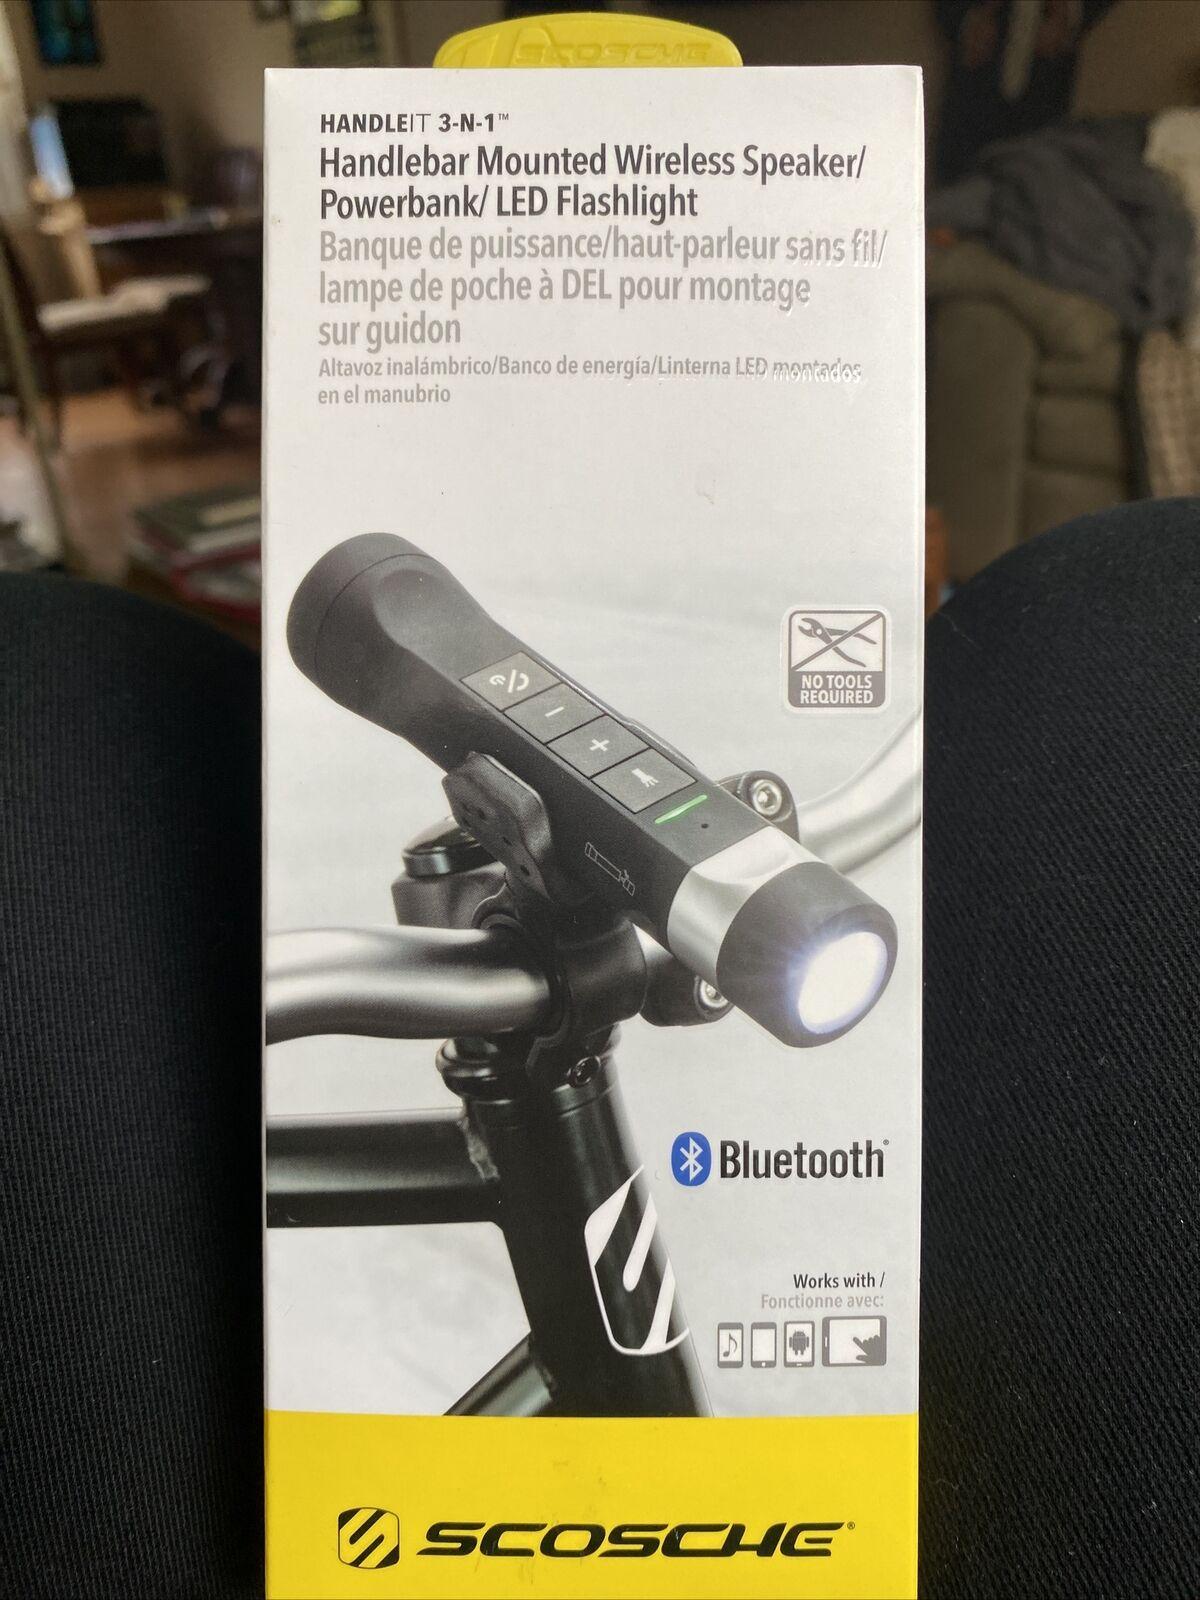 Scosche Handlebar Mounted Wireless Speaker/Powerbank/LED Flashlight brand new